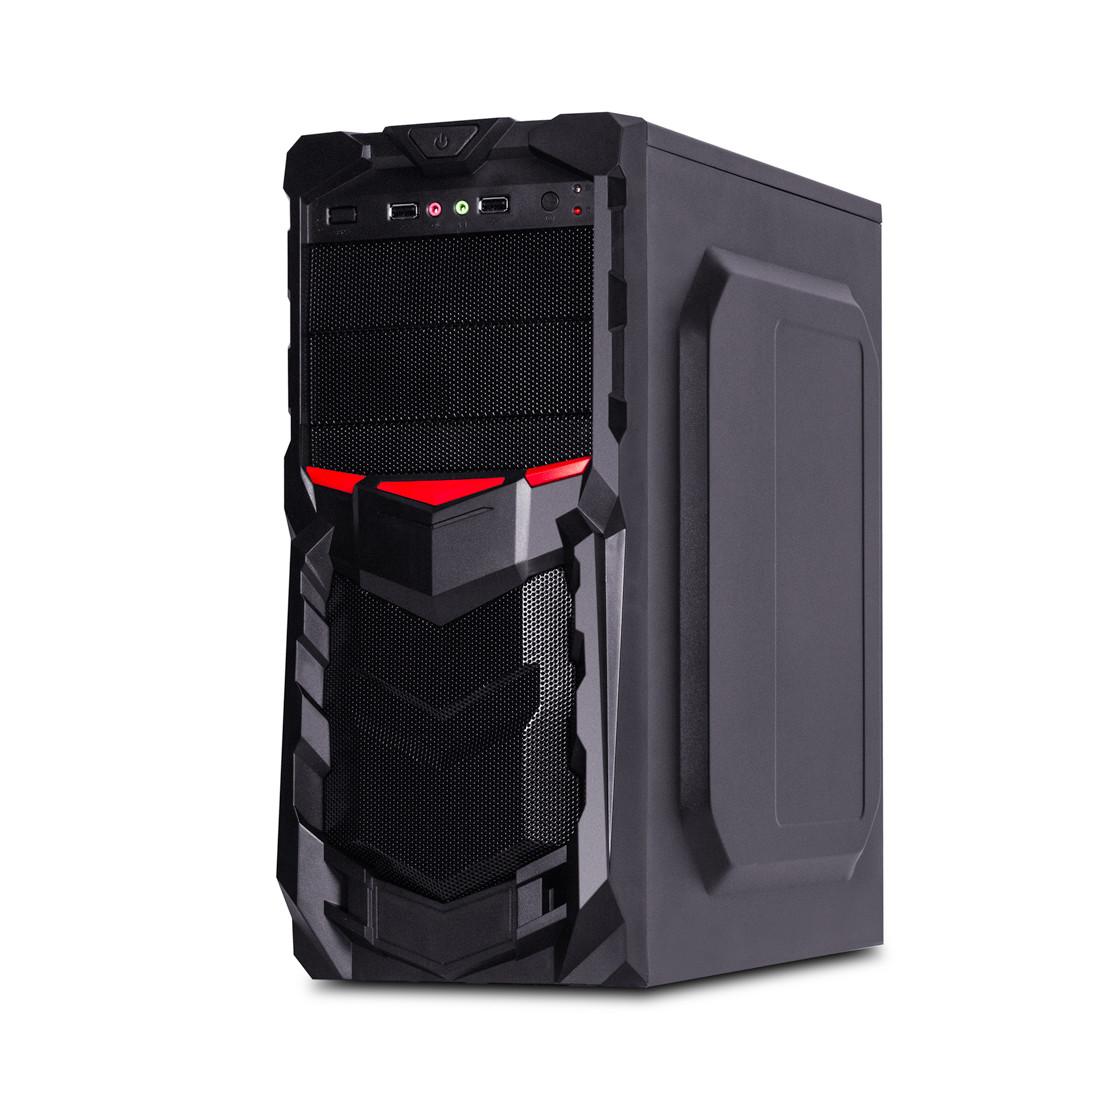 Кейс, Delux, DLC-DW701PS, micro ATX, ATX, USB Hub, HD-Audio, Чёрный, Б/П Delux DP-400, (Вентилятор 8см) 400W, Заводская Сборка (Оригинал)